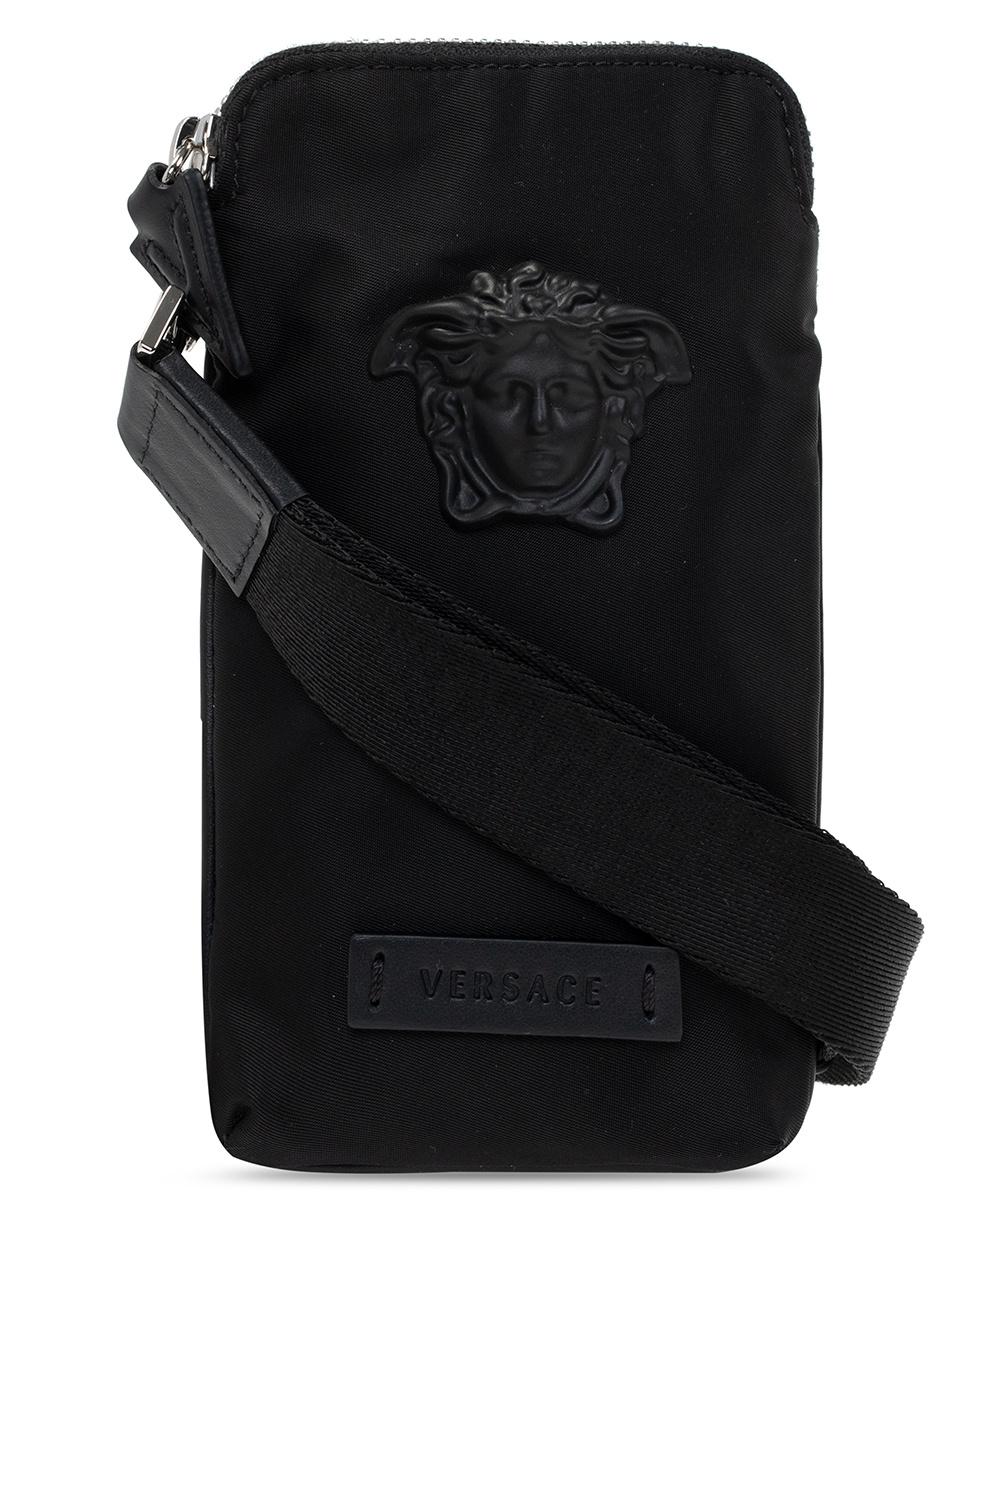 Versace Medusa head pouch